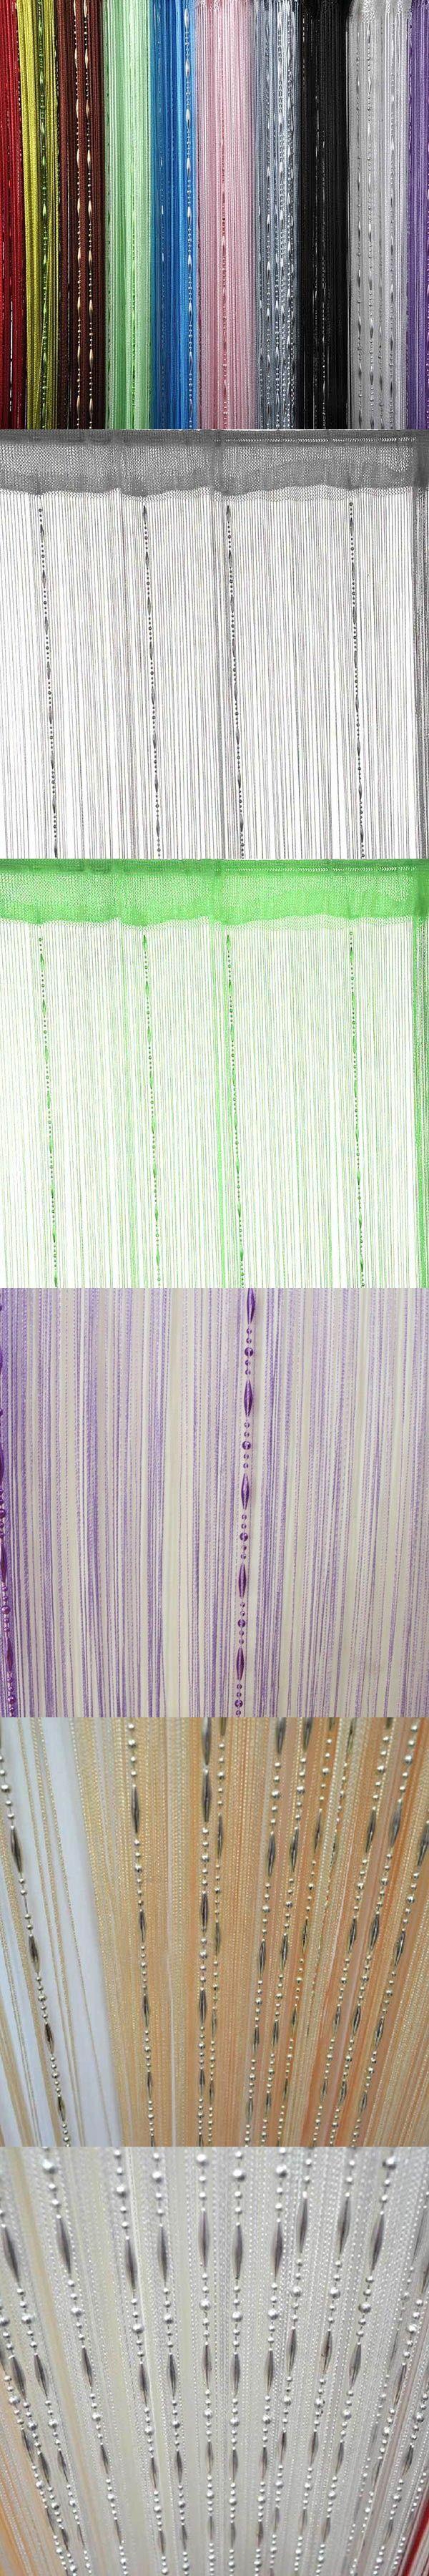 String curtain ideas - Curtain Fashion Chain Beads Fringe String Curtain Panel Window Room Divider Home Decor